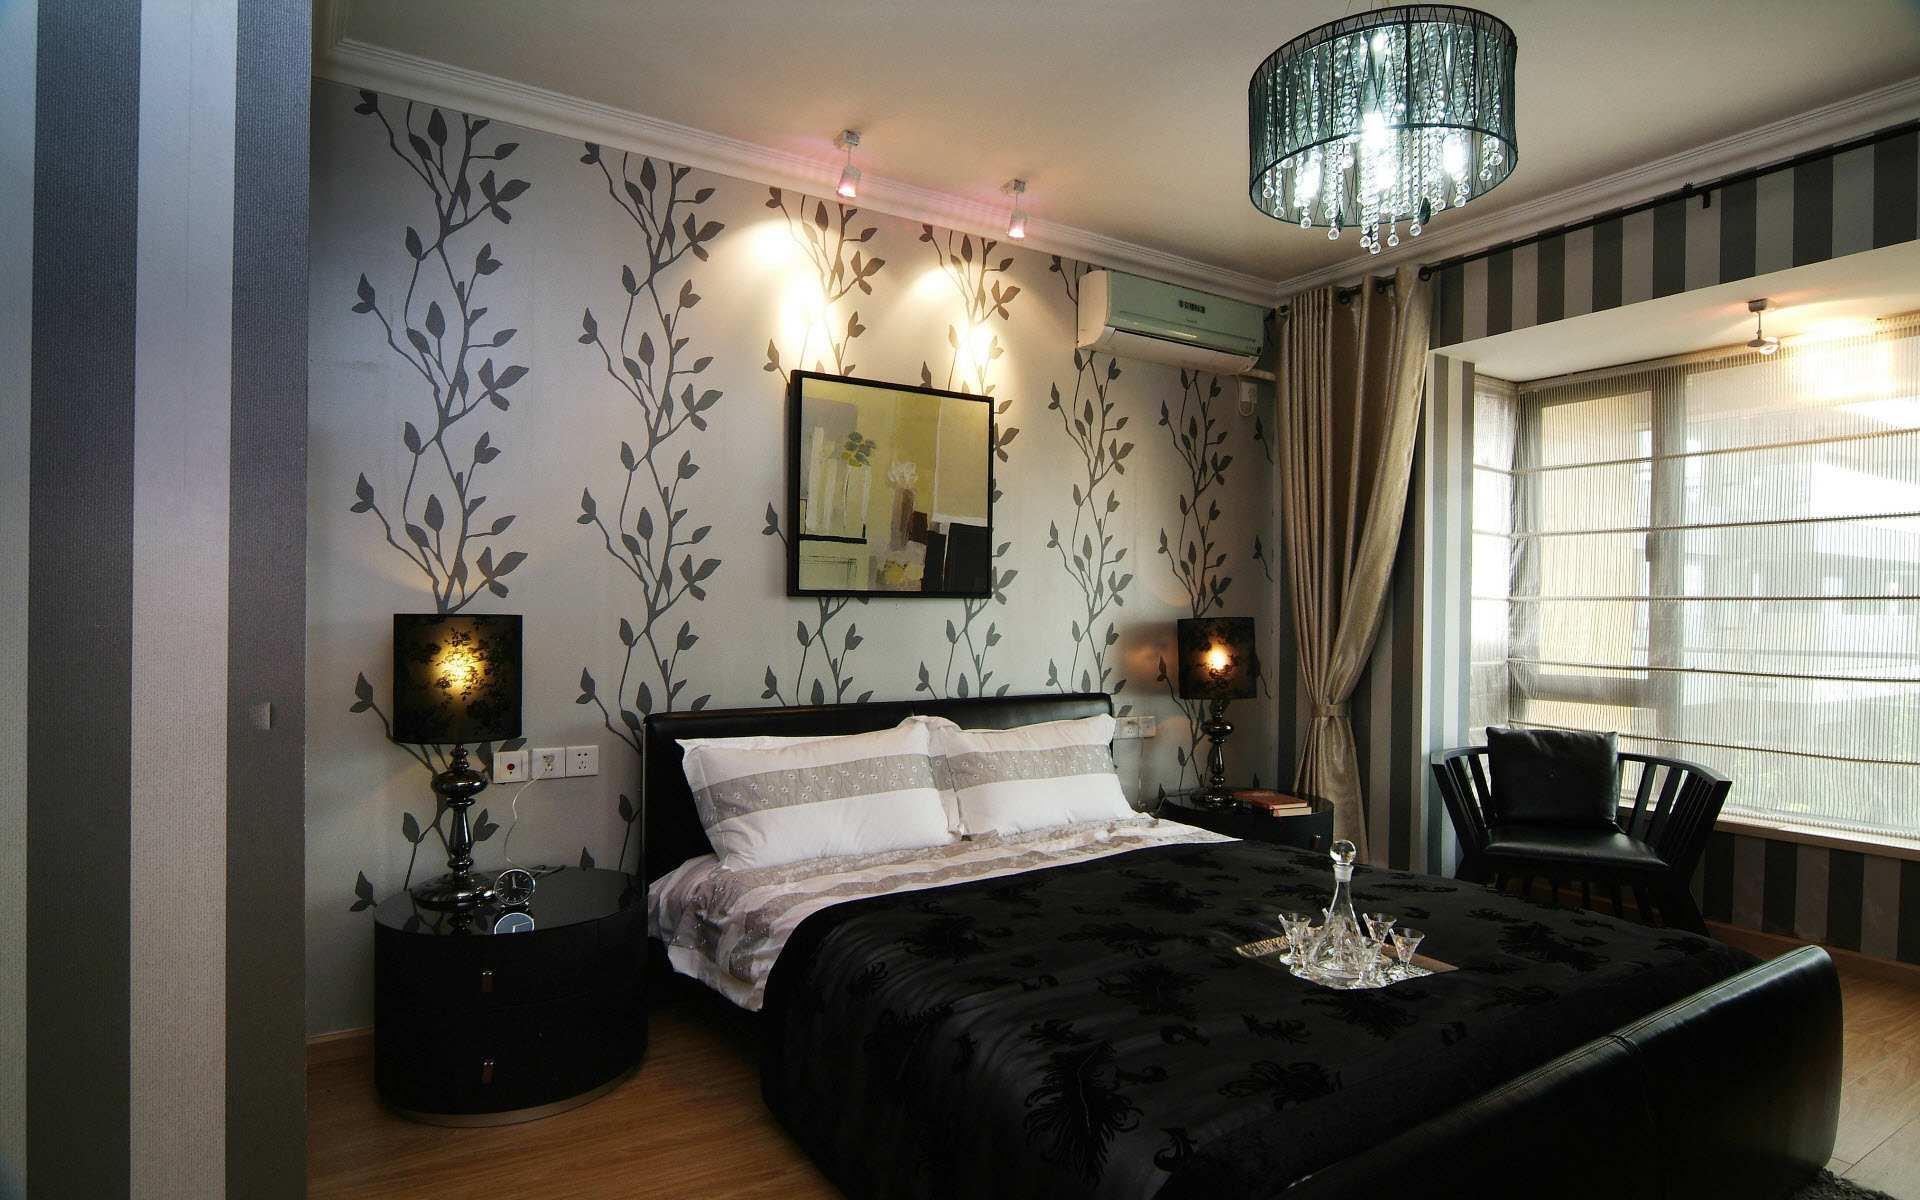 Art Deco Wallpaper Borders Patterns Interior Design Bedroom Wallpaper For Black Furniture 2034884 Hd Wallpaper Backgrounds Download